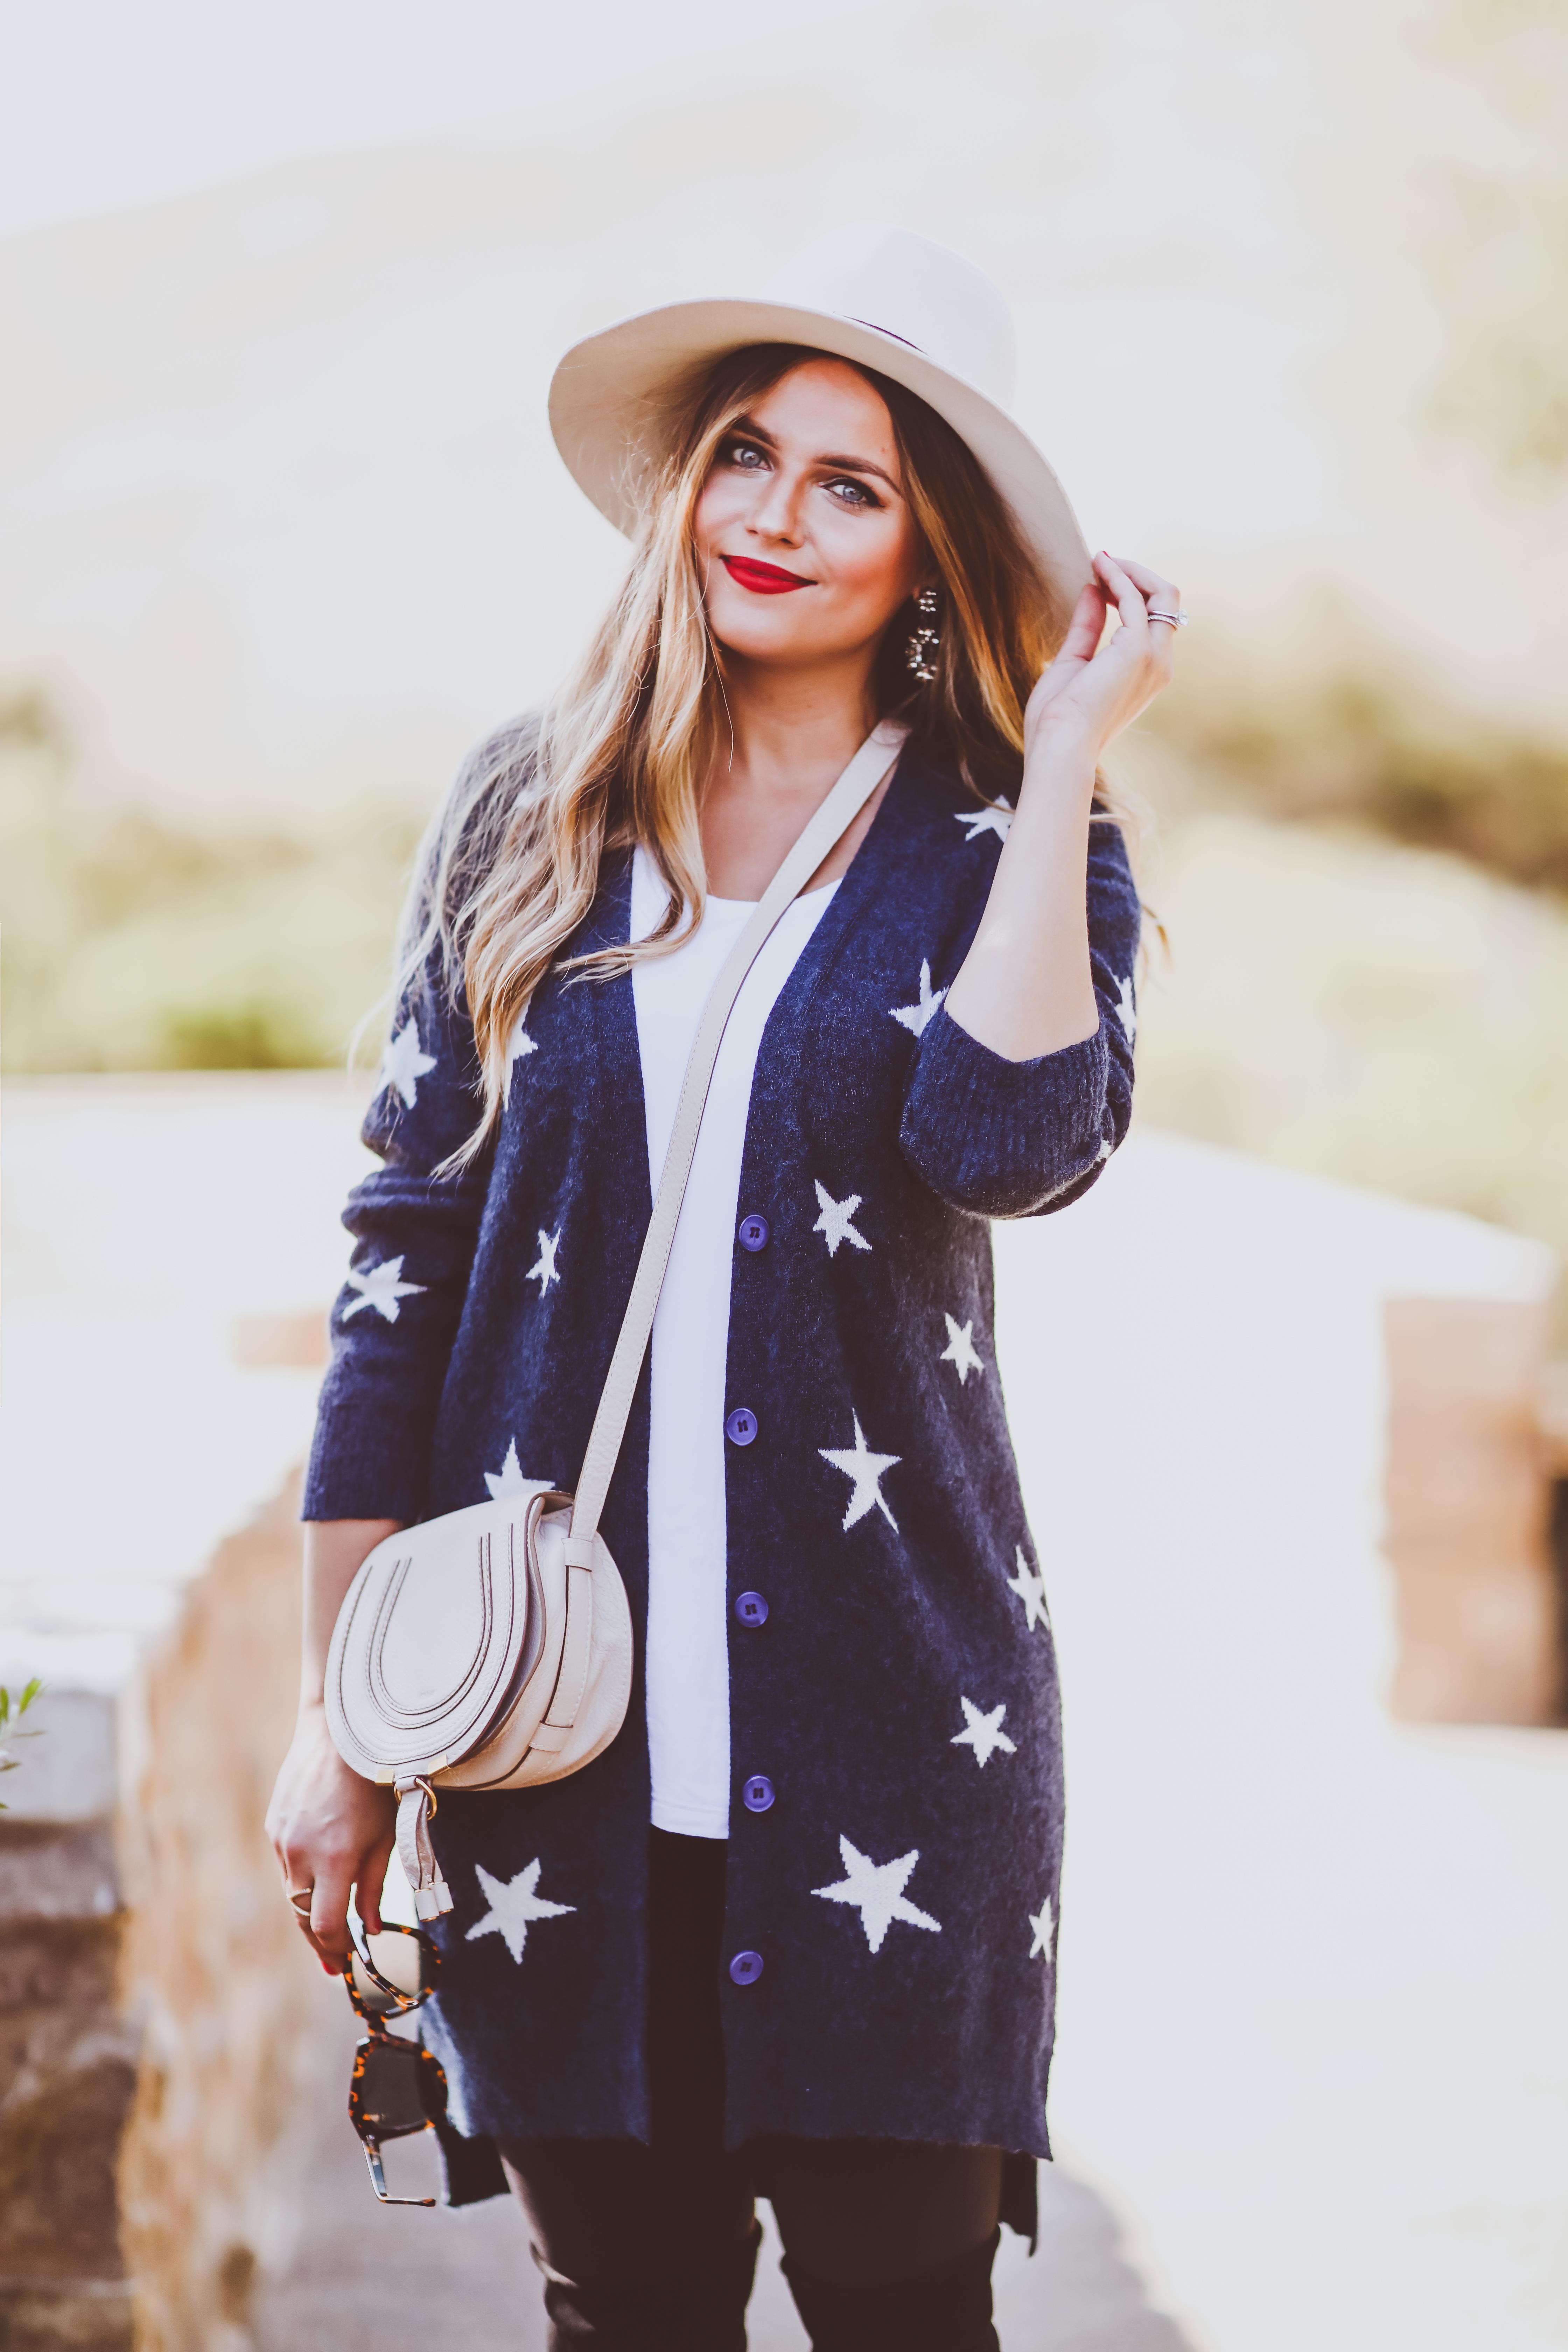 #OOTD // Star Cardigan, Nursing Tee & Leggings | BondGirlGlam.com